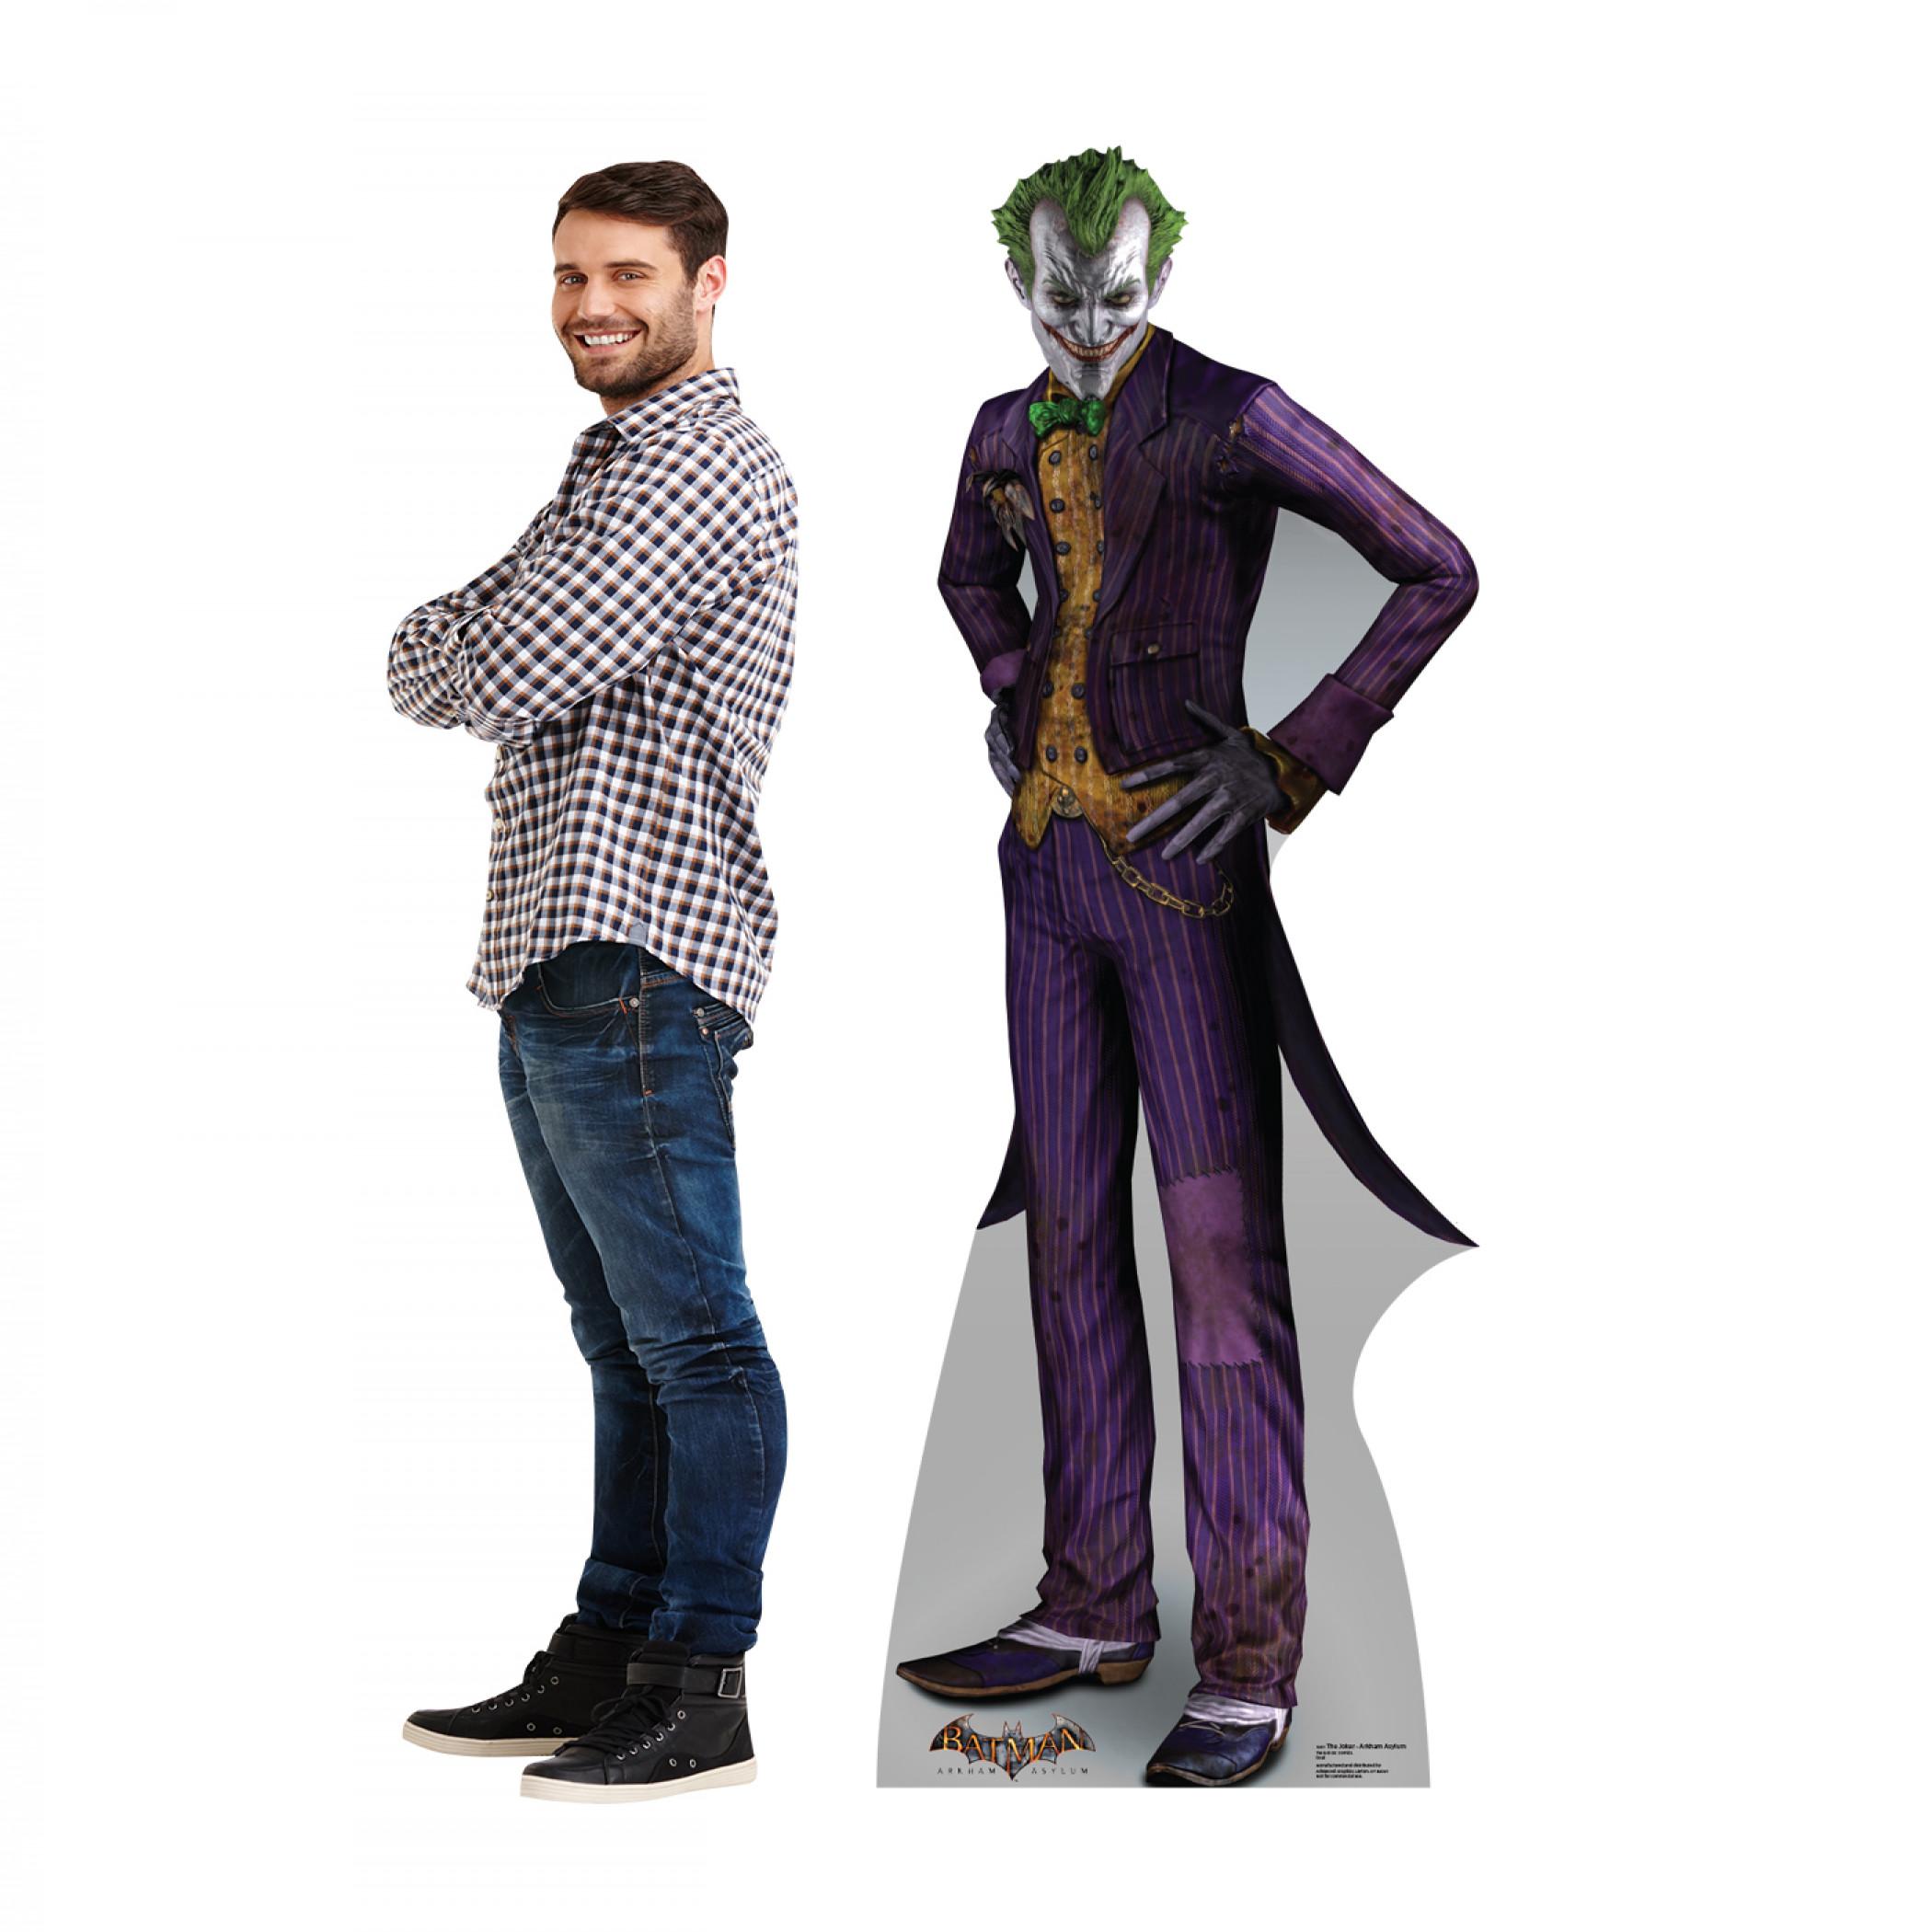 The Joker Arkham Asylum Cardboard Stand Up